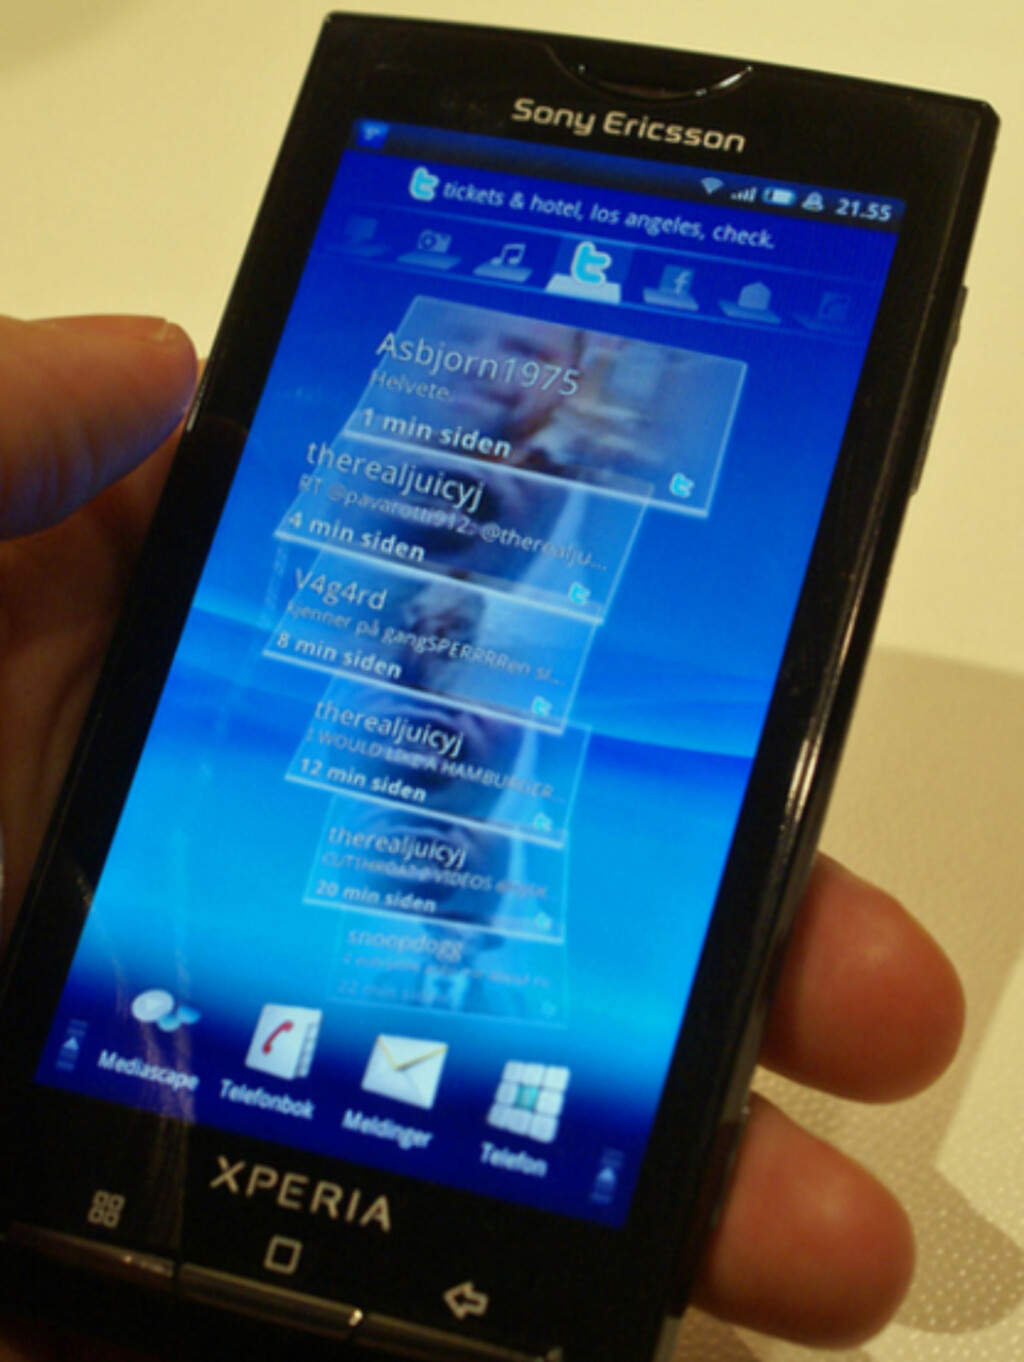 image: Sony Ericsson Xperia X10